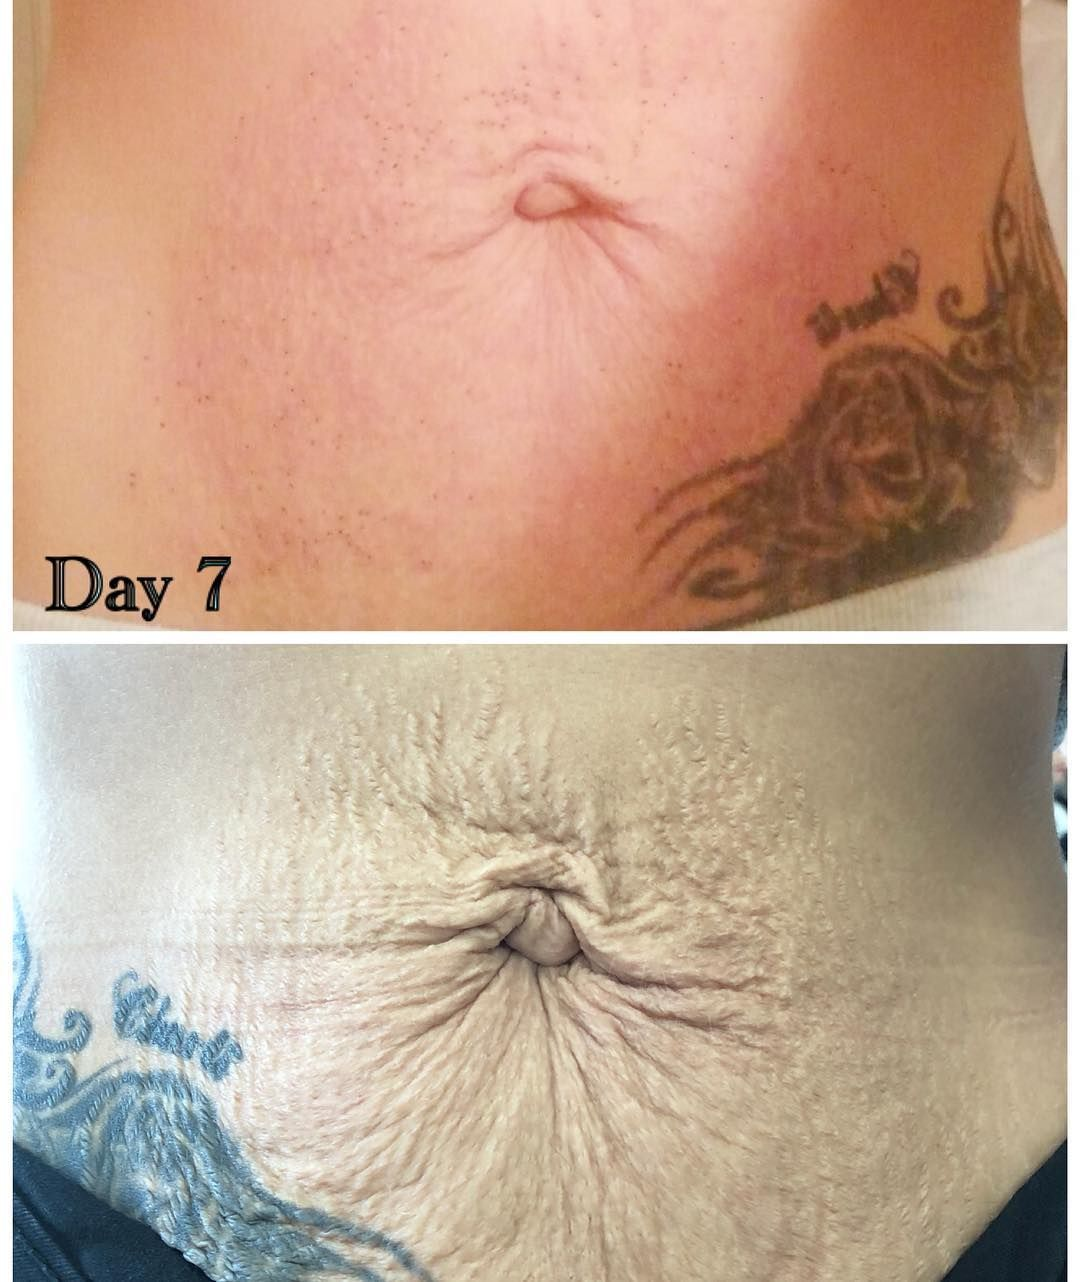 Plasma/ Fibroblasts healing journey day 7 #plasma